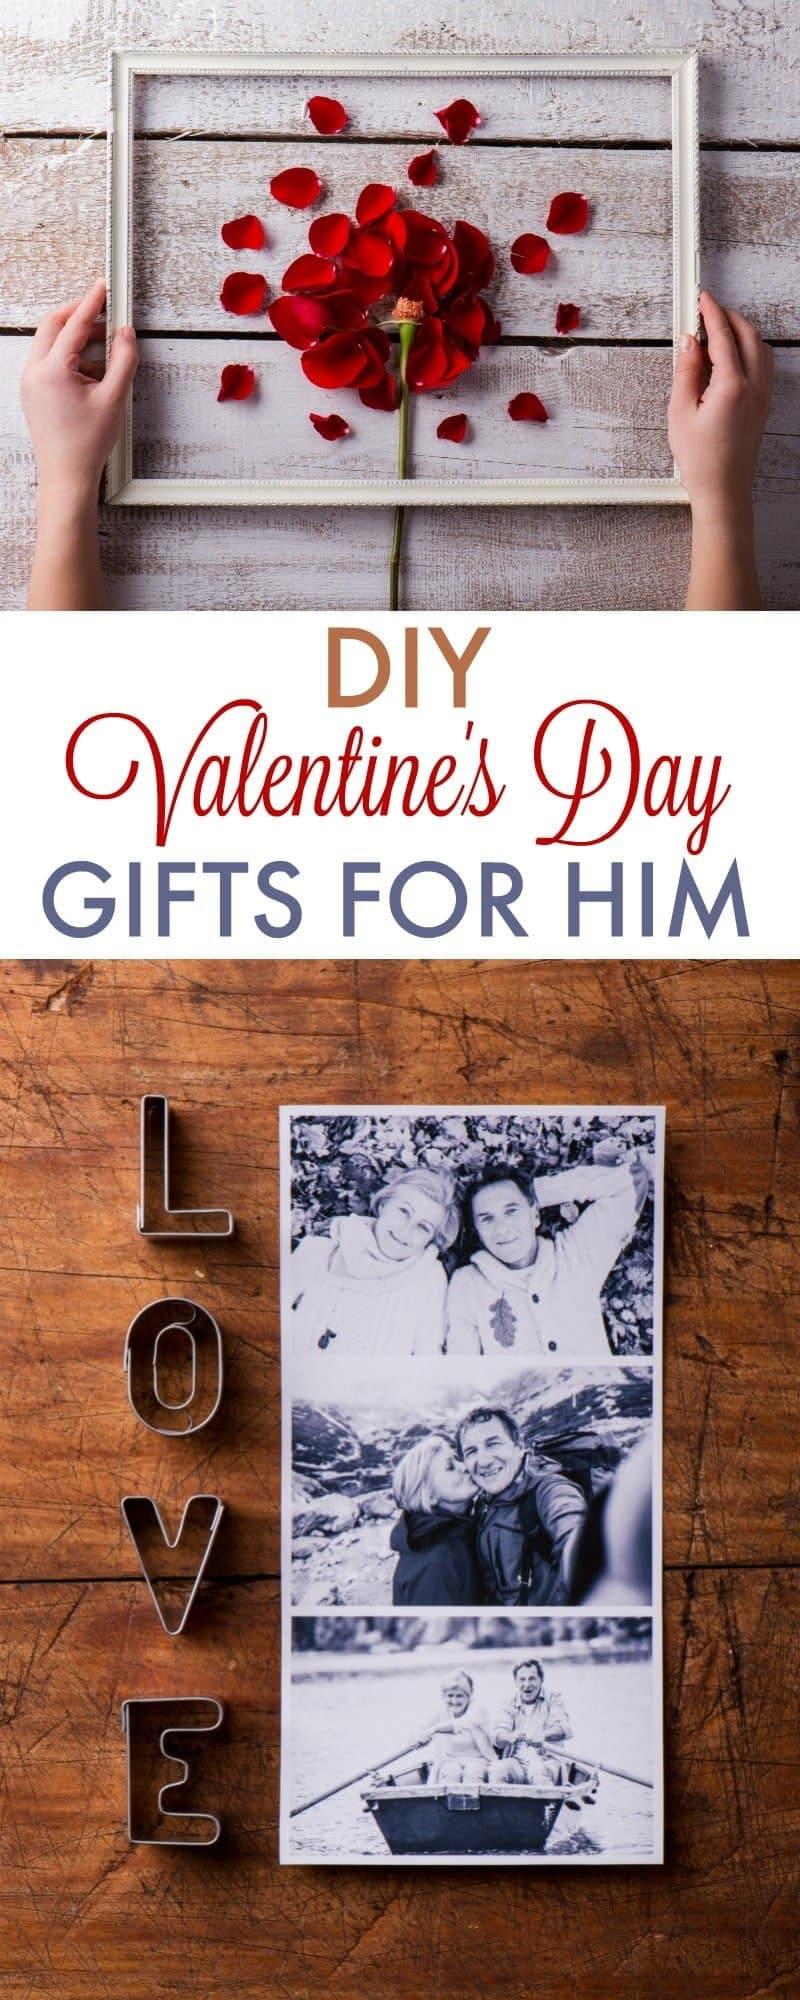 DIY Gifts For Him  DIY Valentine s Day Gifts for Boyfriend 730 Sage Street